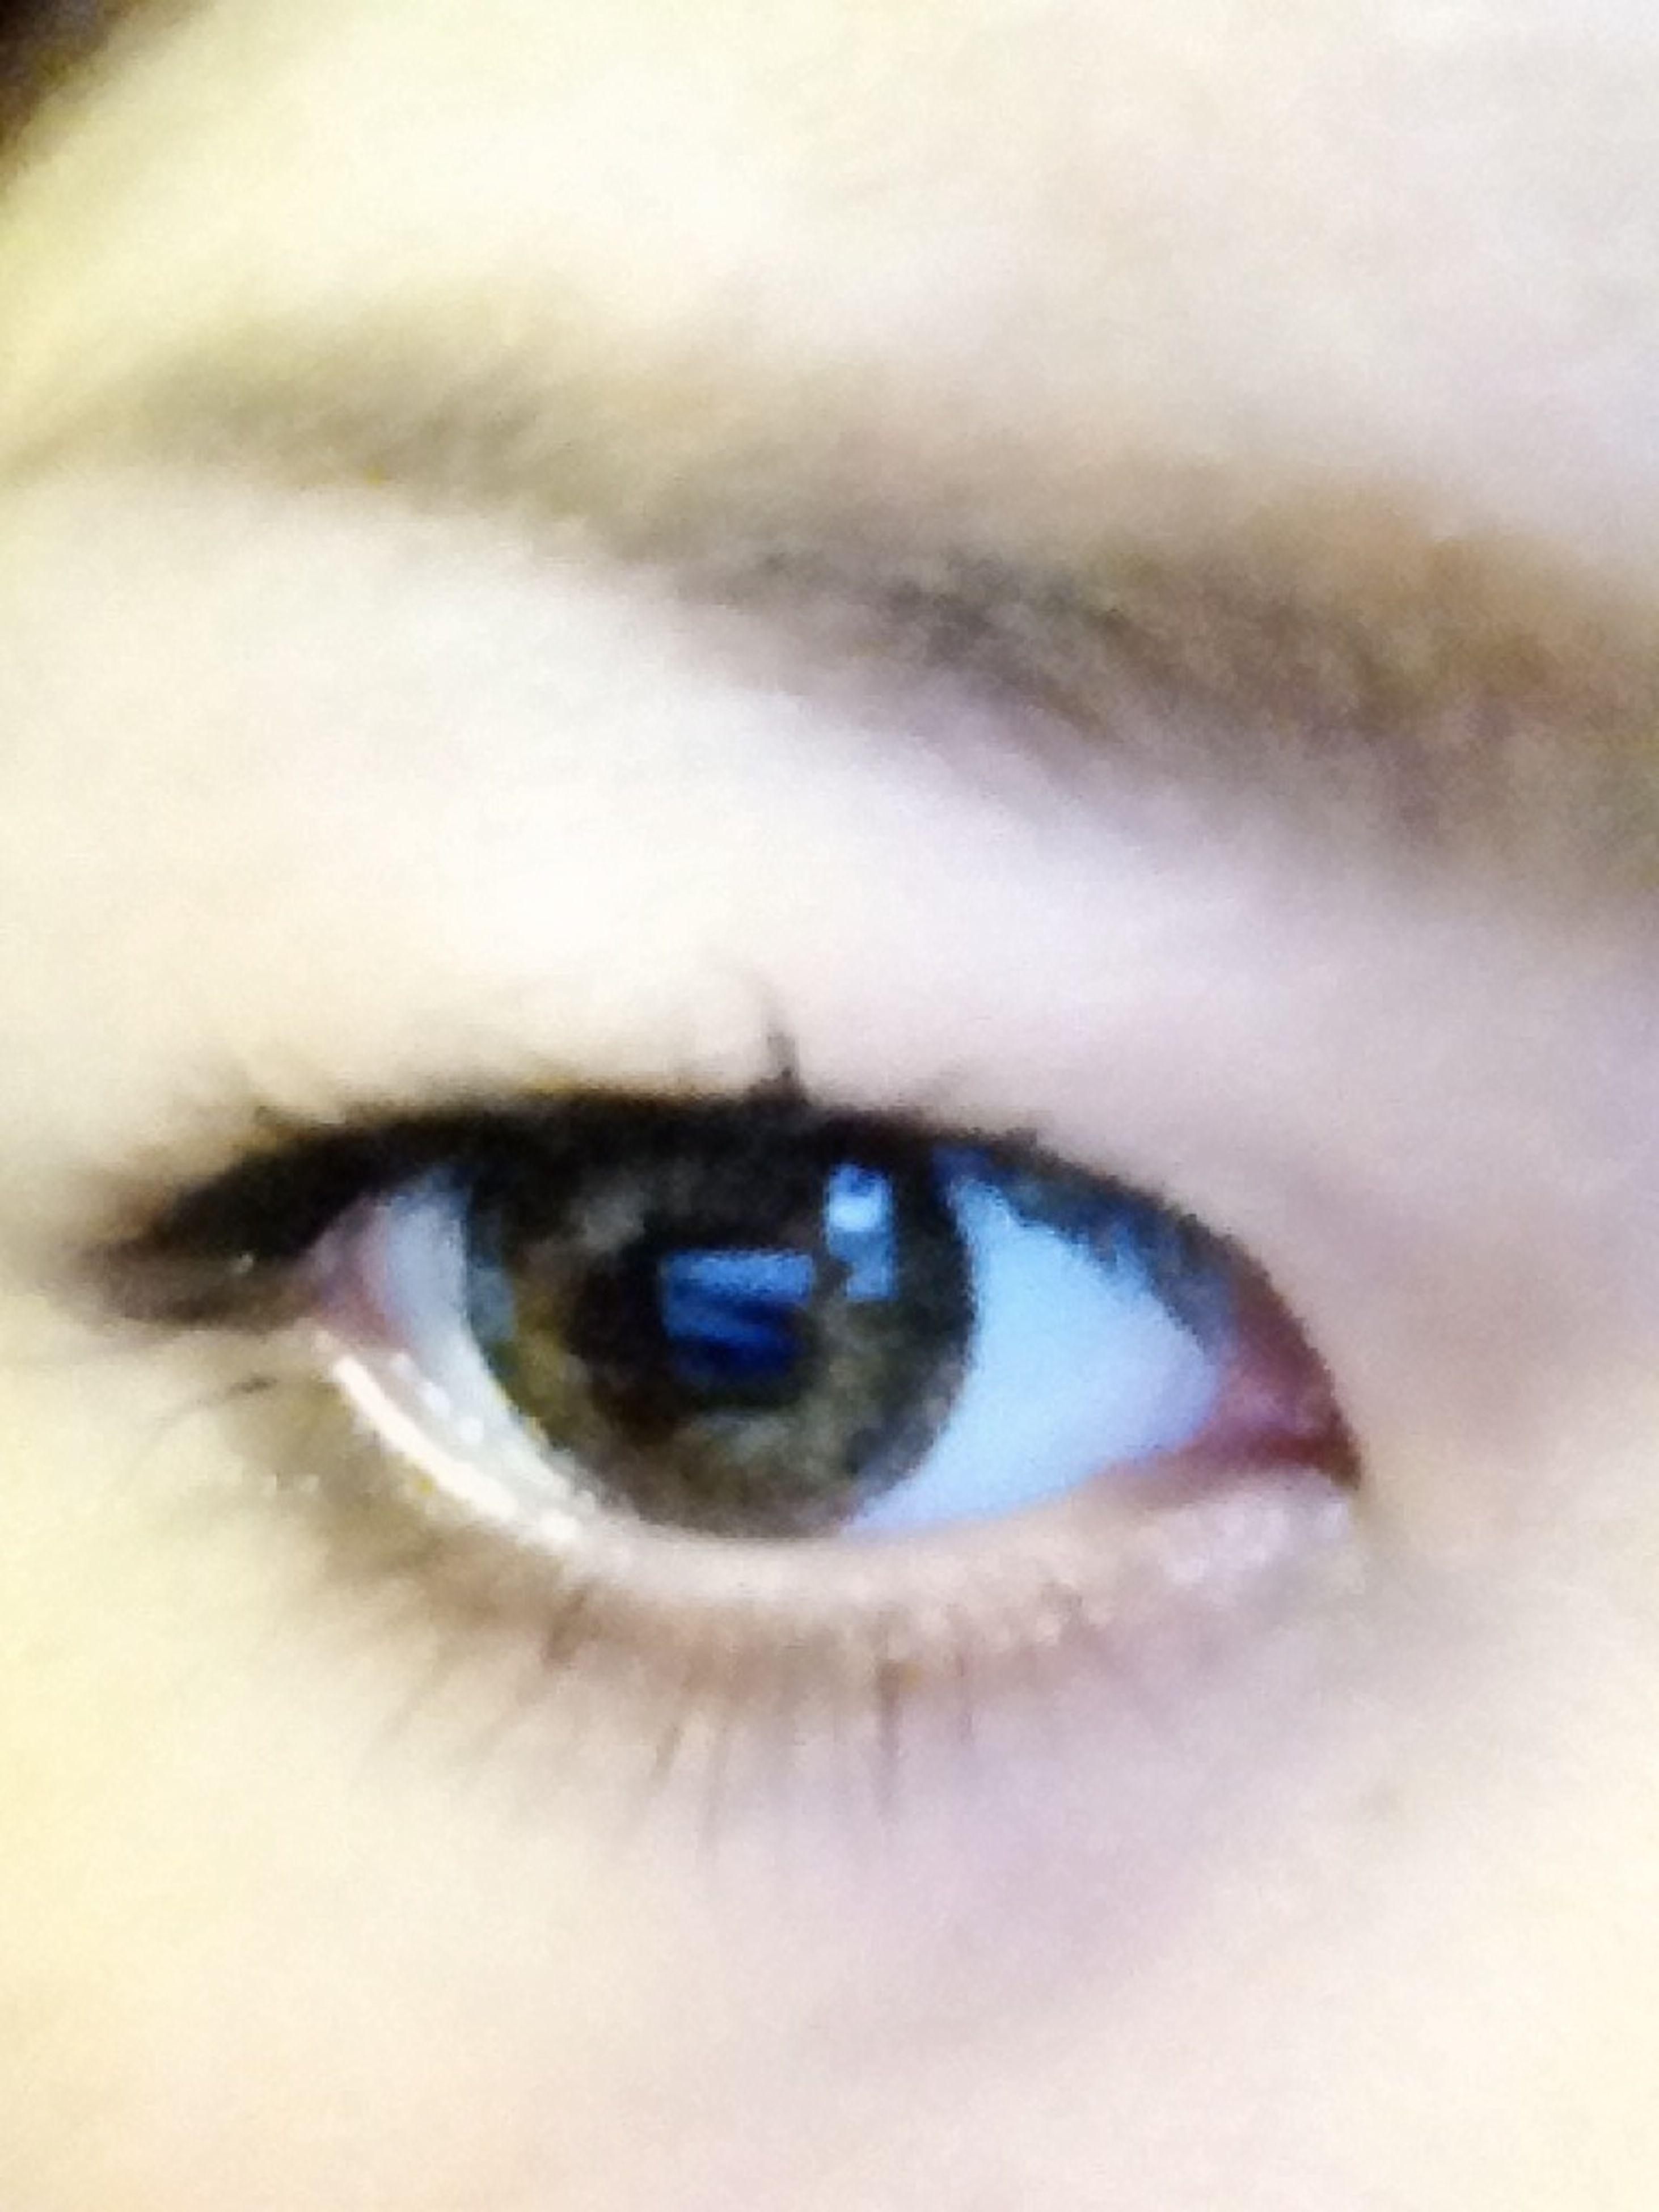 human eye, eyelash, close-up, eyesight, looking at camera, portrait, sensory perception, extreme close-up, part of, eyeball, iris - eye, indoors, extreme close up, human face, human skin, vision, eyebrow